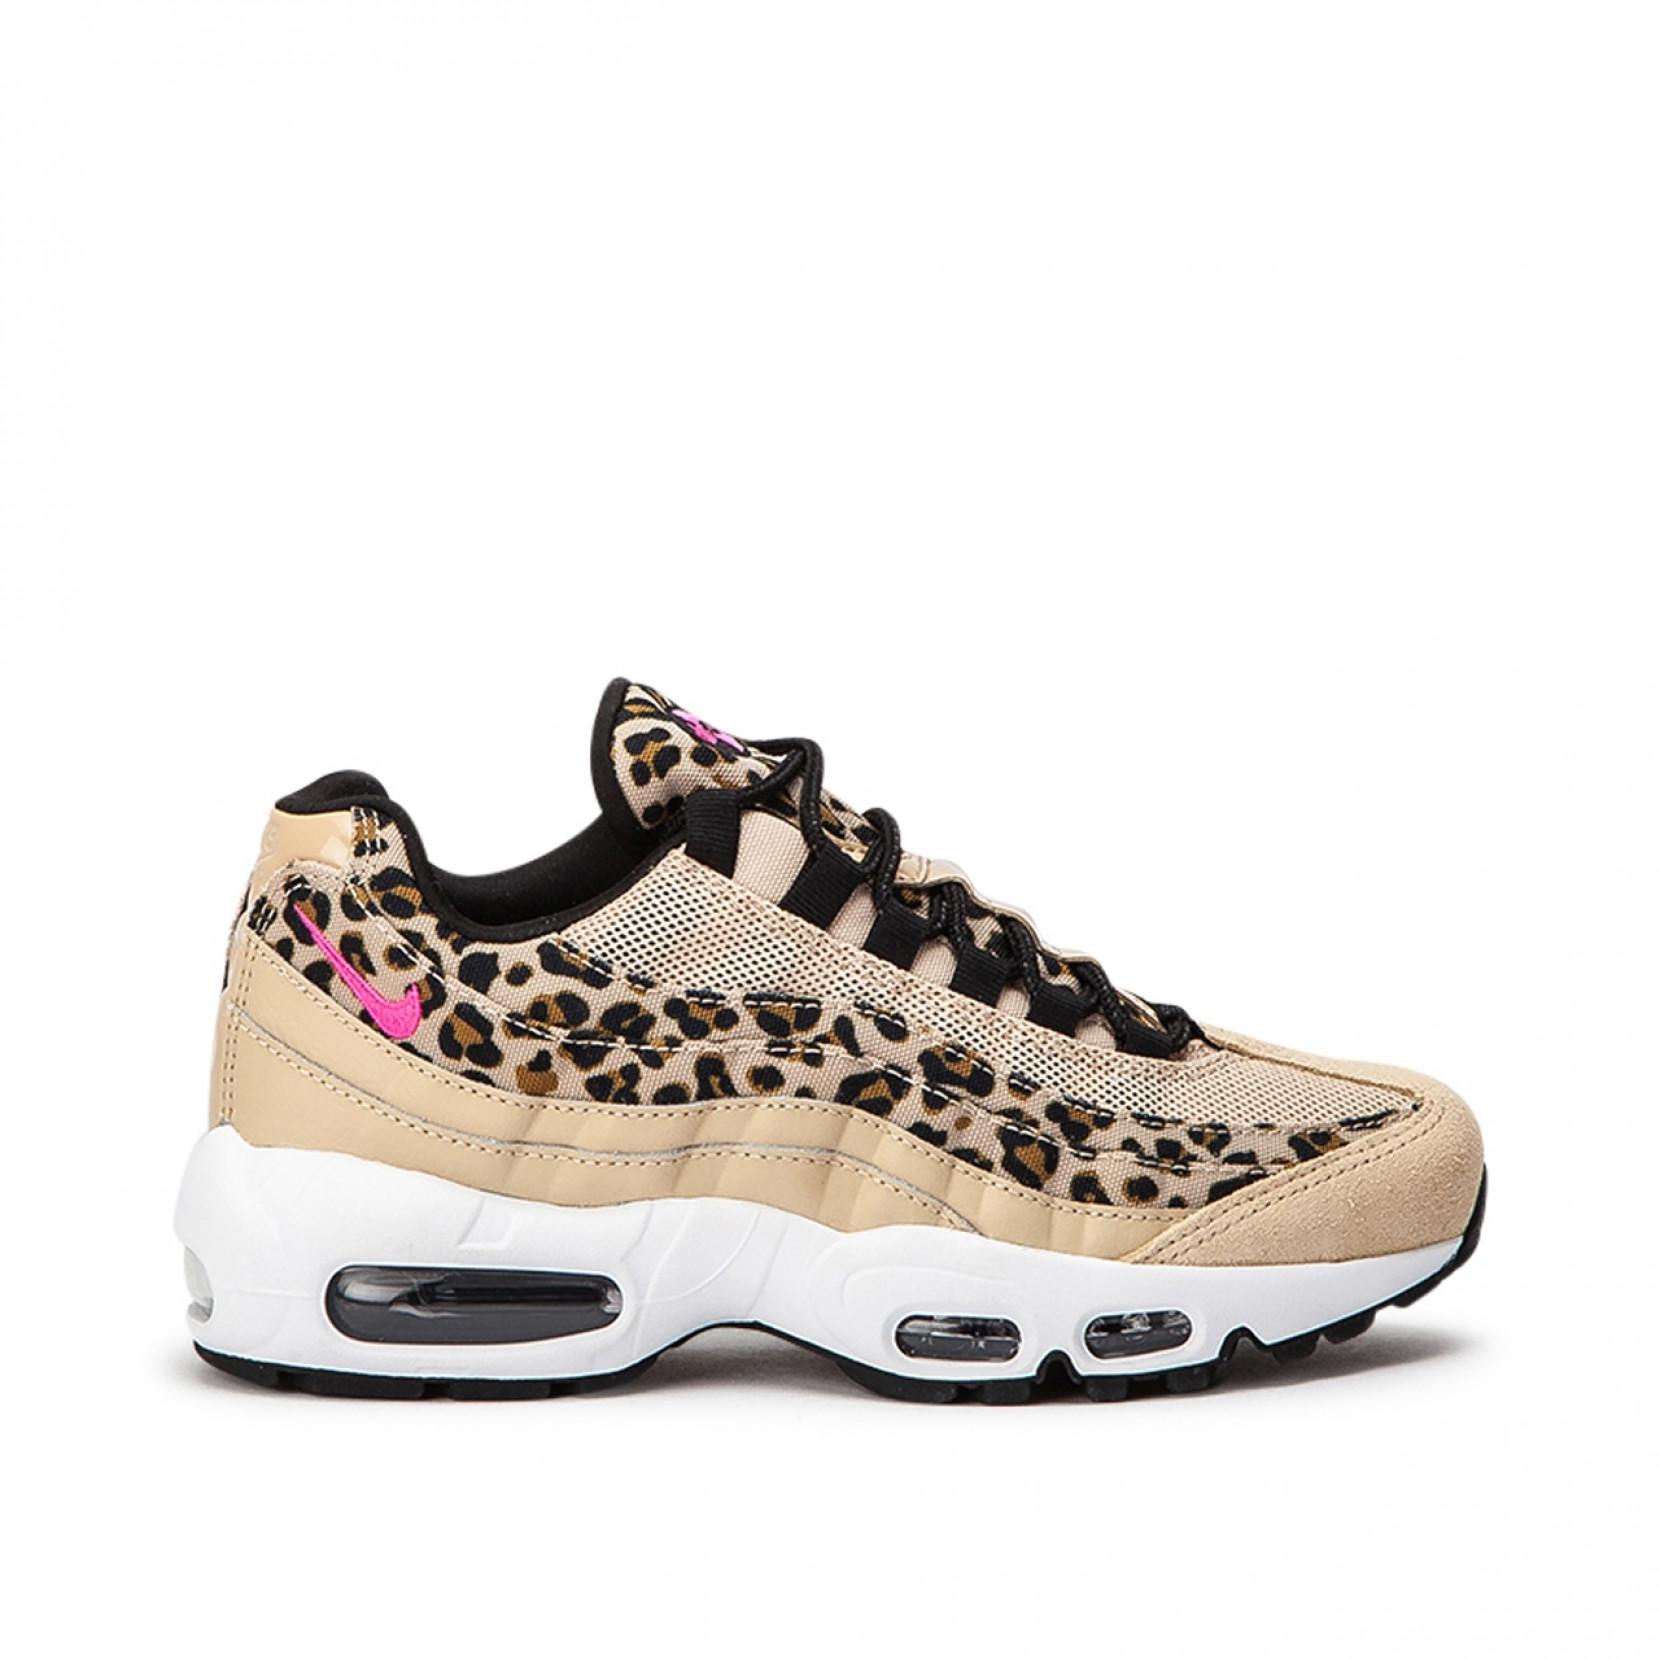 air max 95 leopardate